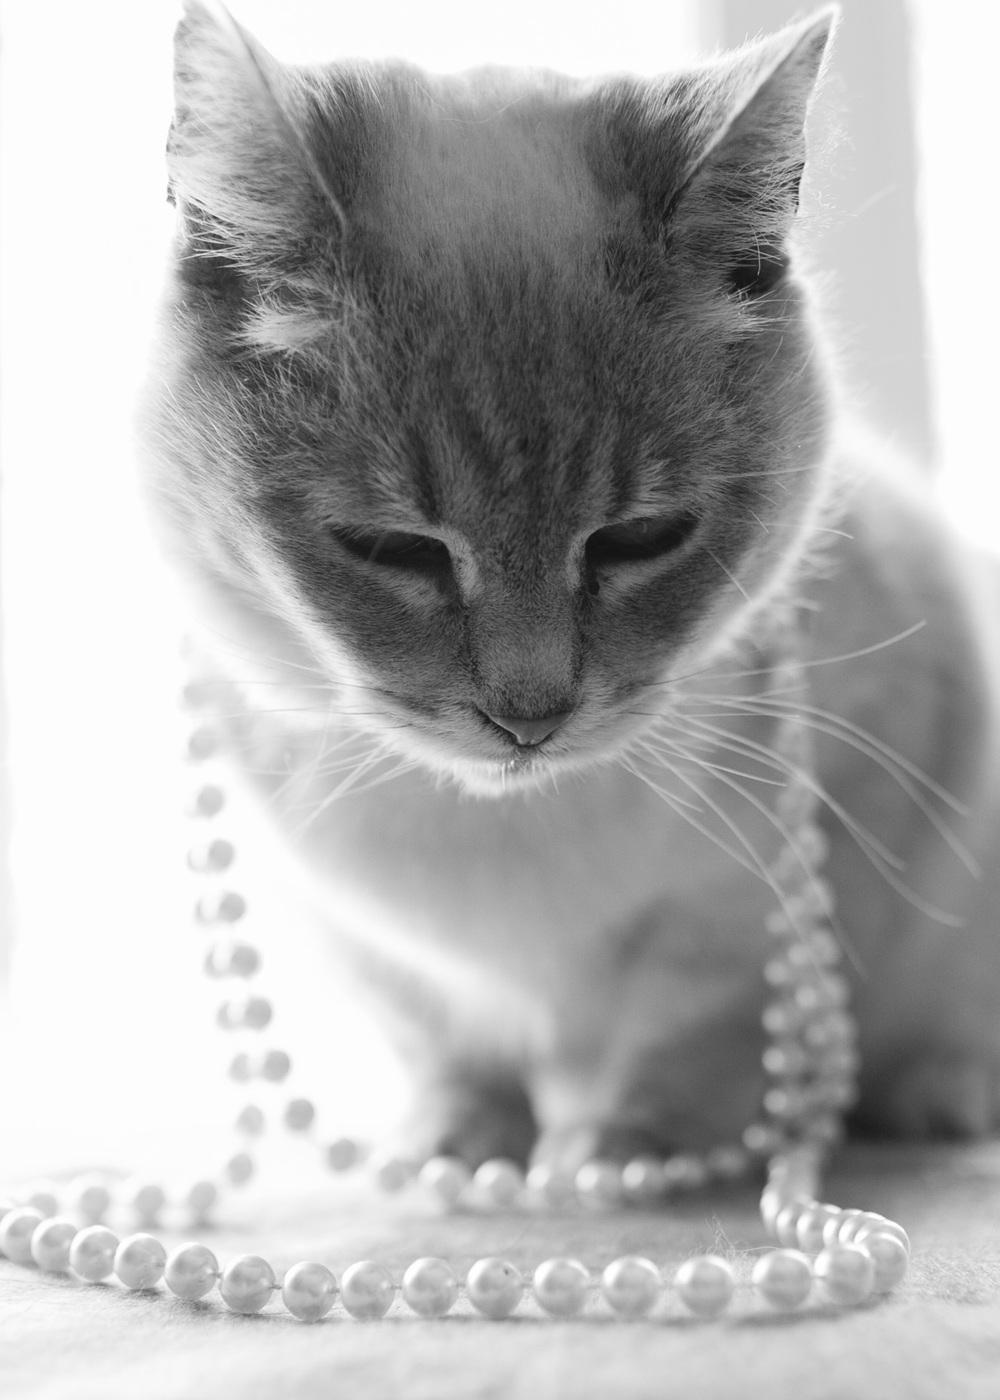 Meow_38.jpg